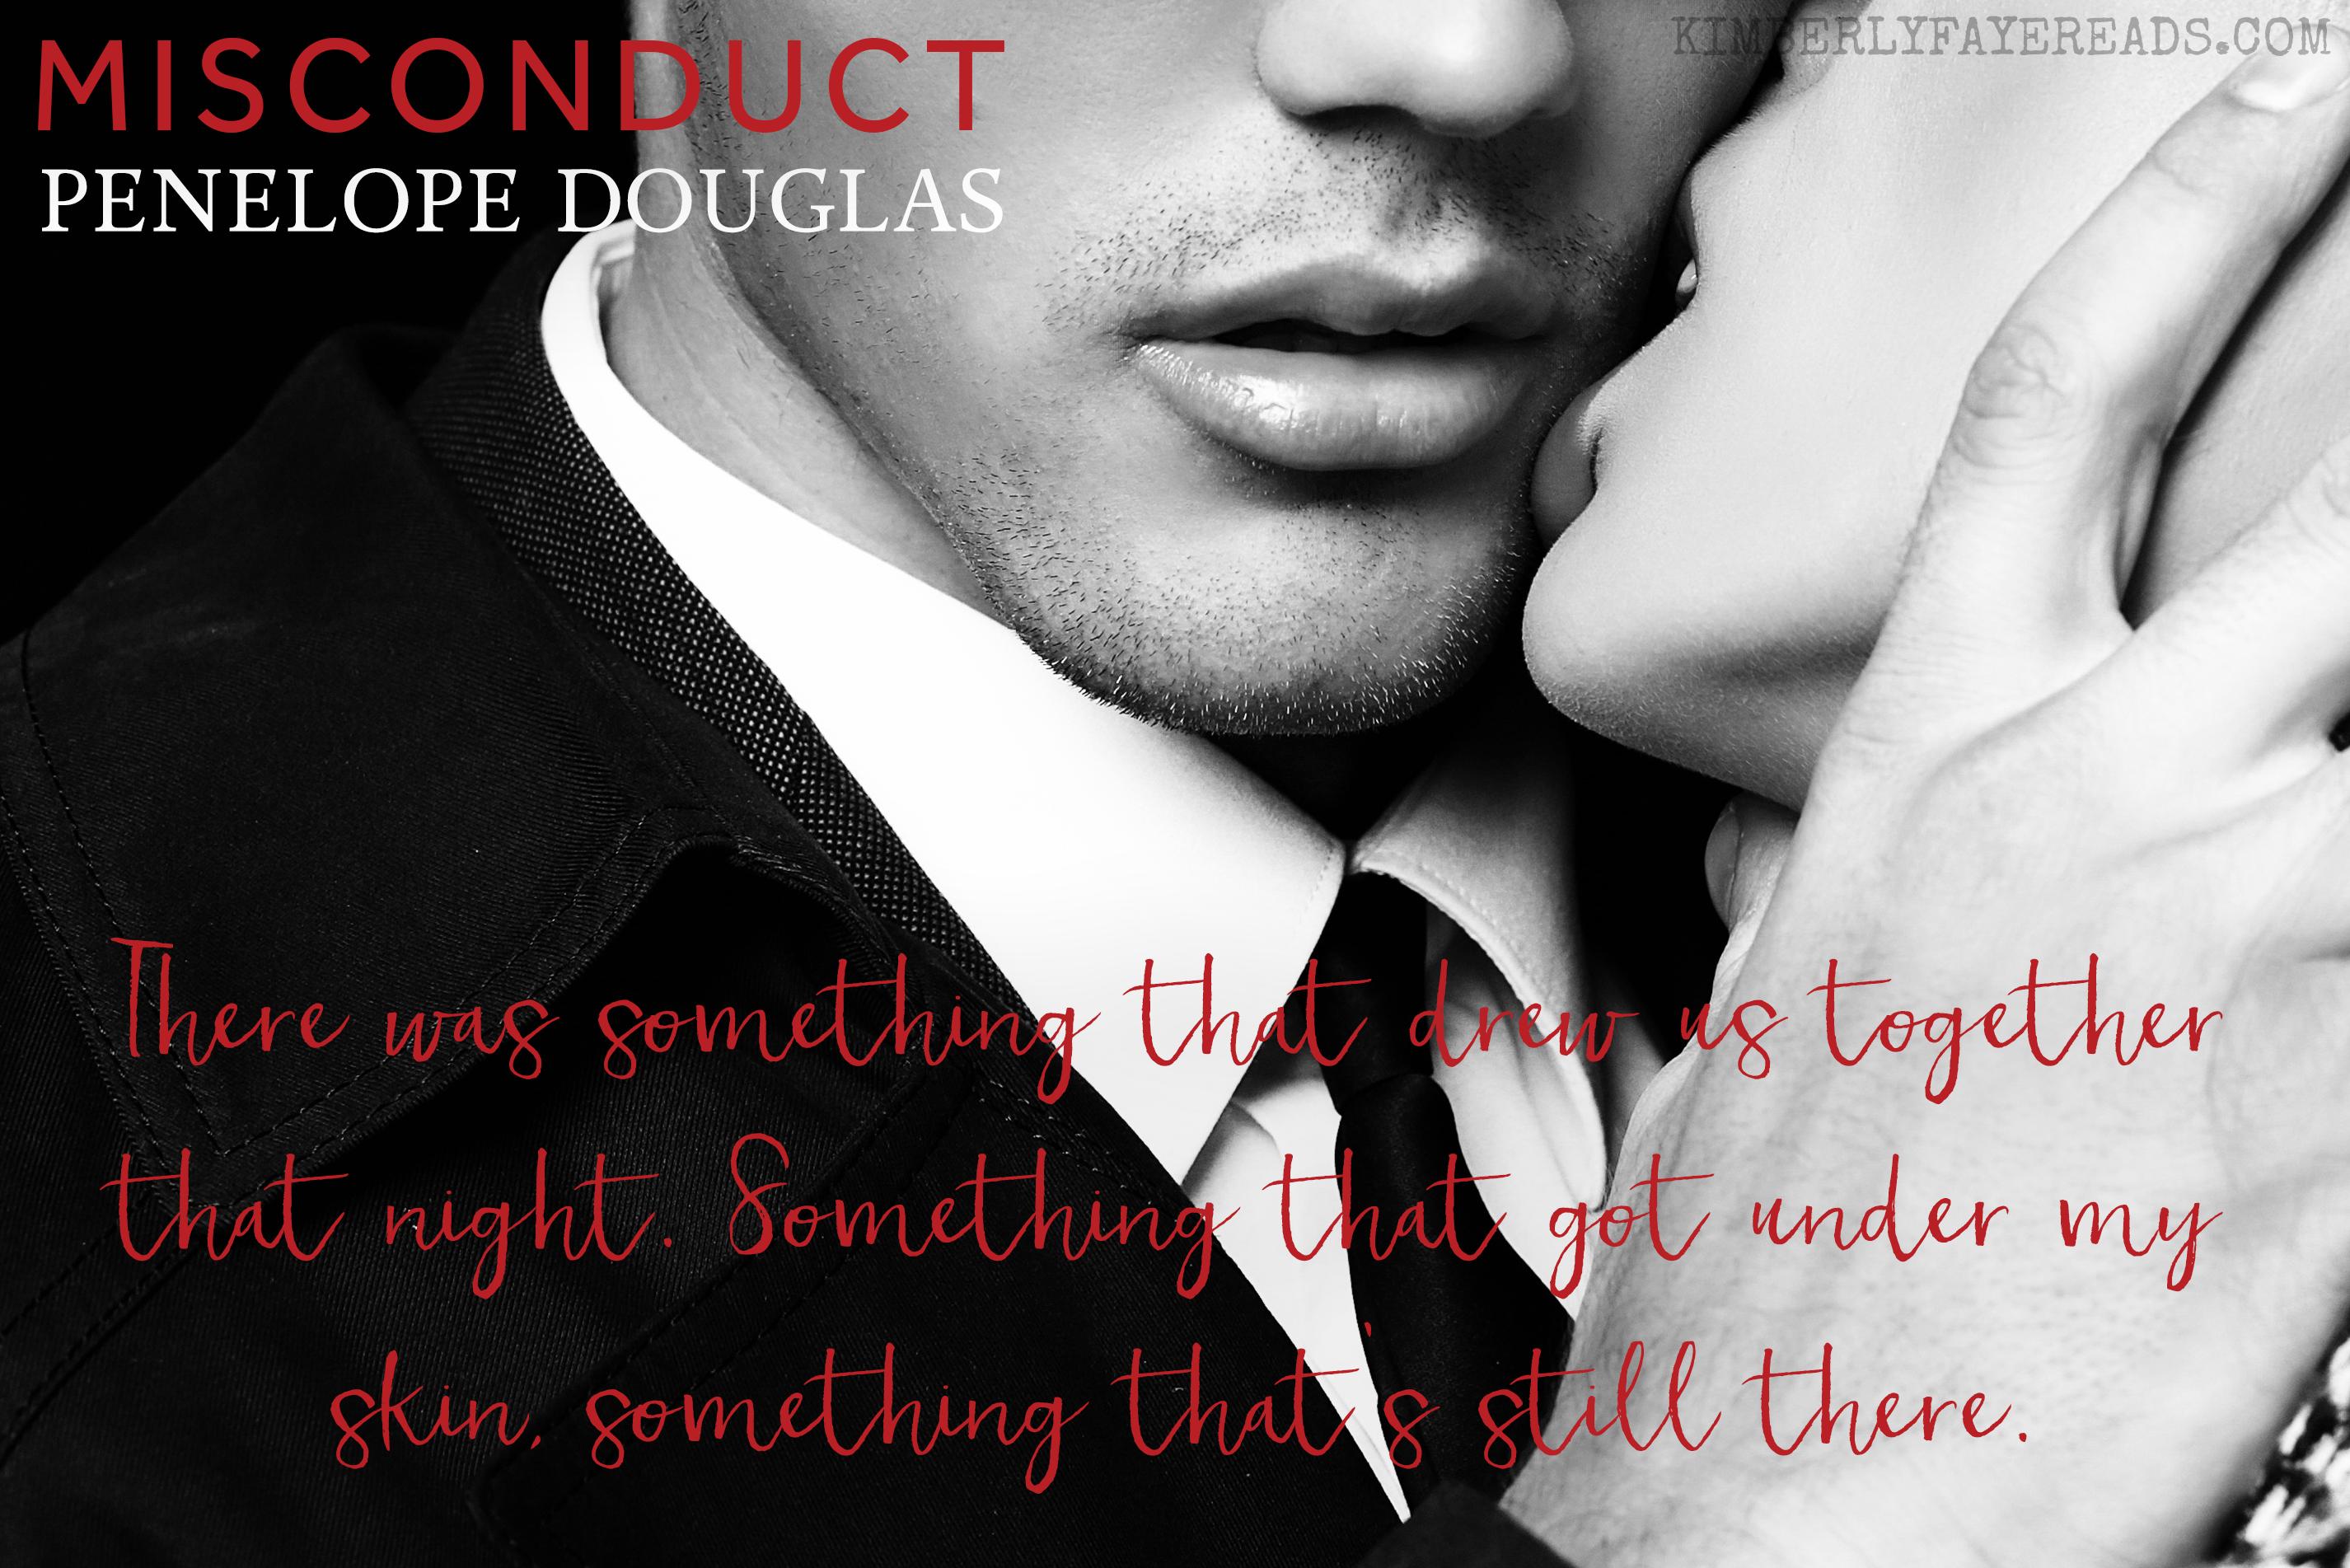 Misconduct_1